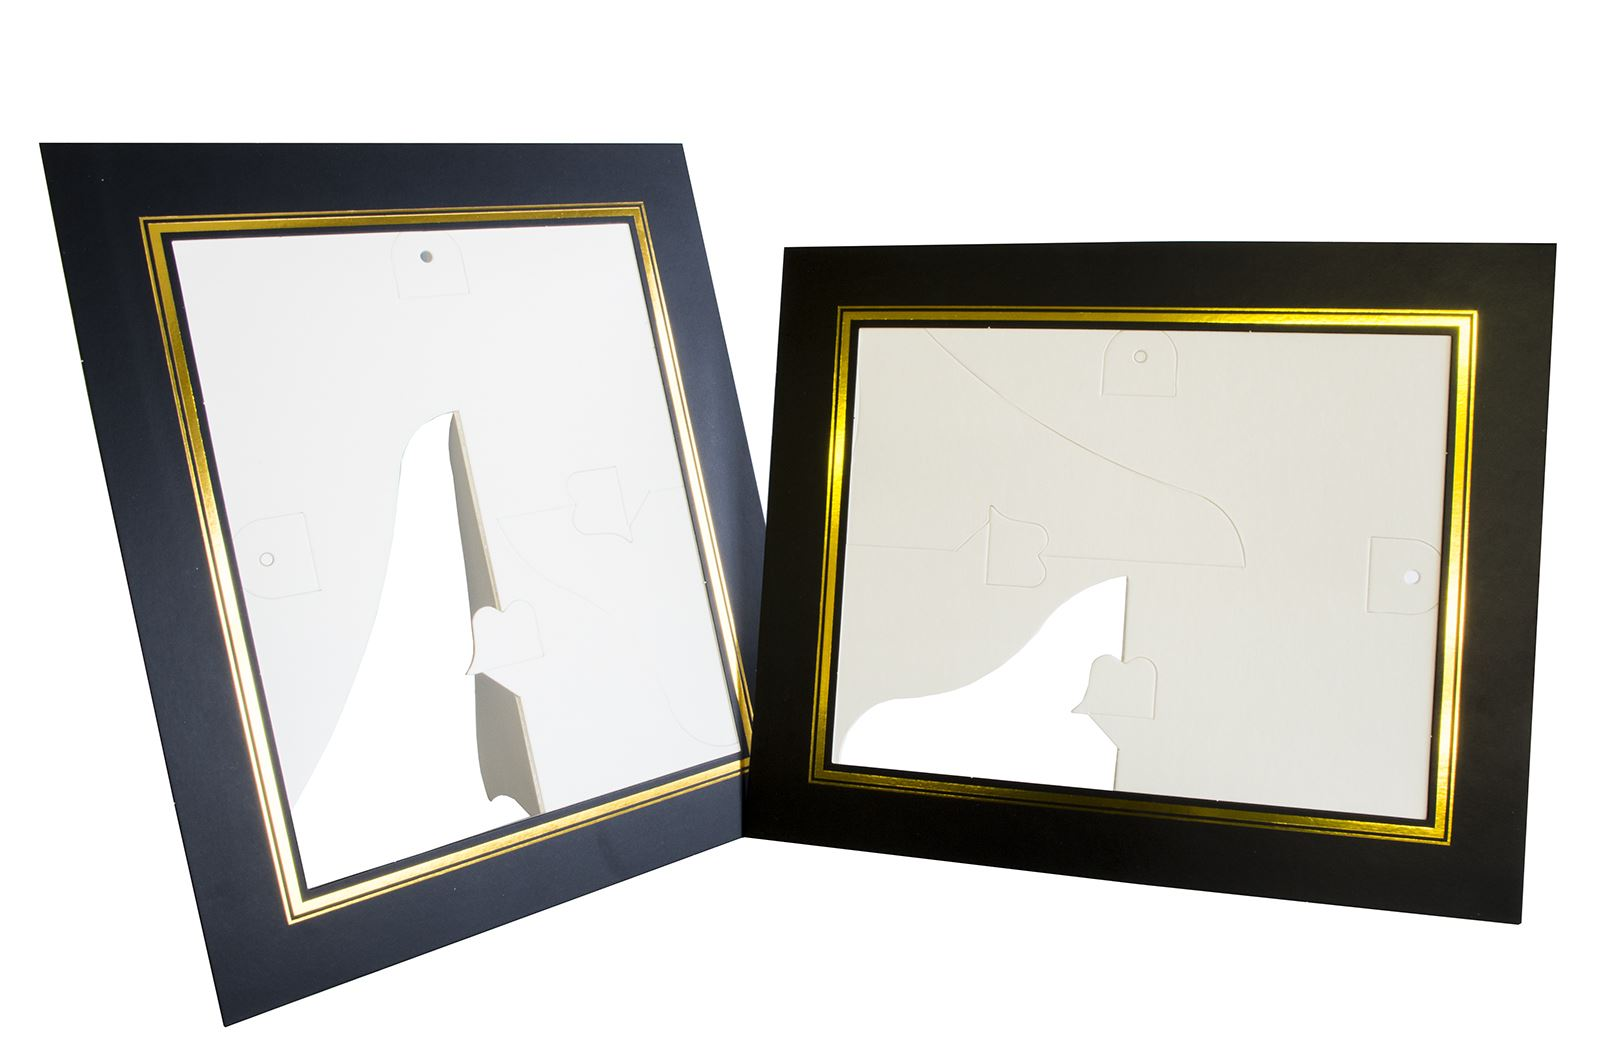 8 pack jsp photo strut mount photo frame picture holder for Photo clip wall frame